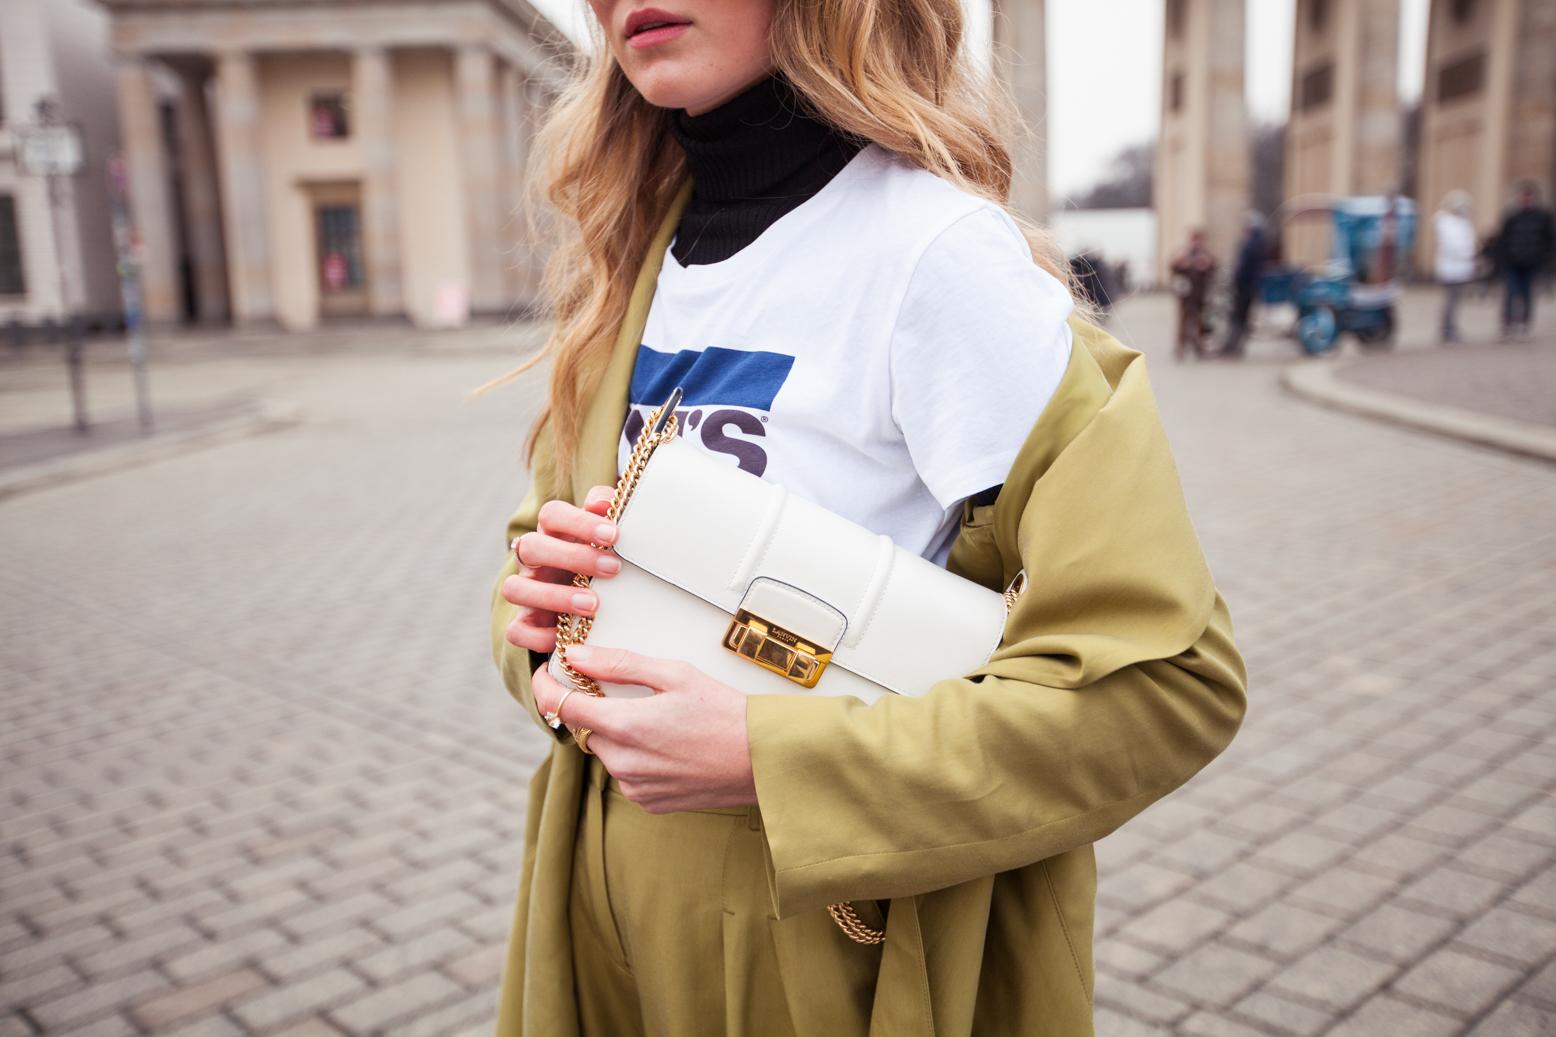 fashionweek-streetstyle-ivy&oak-livia-auer-6027